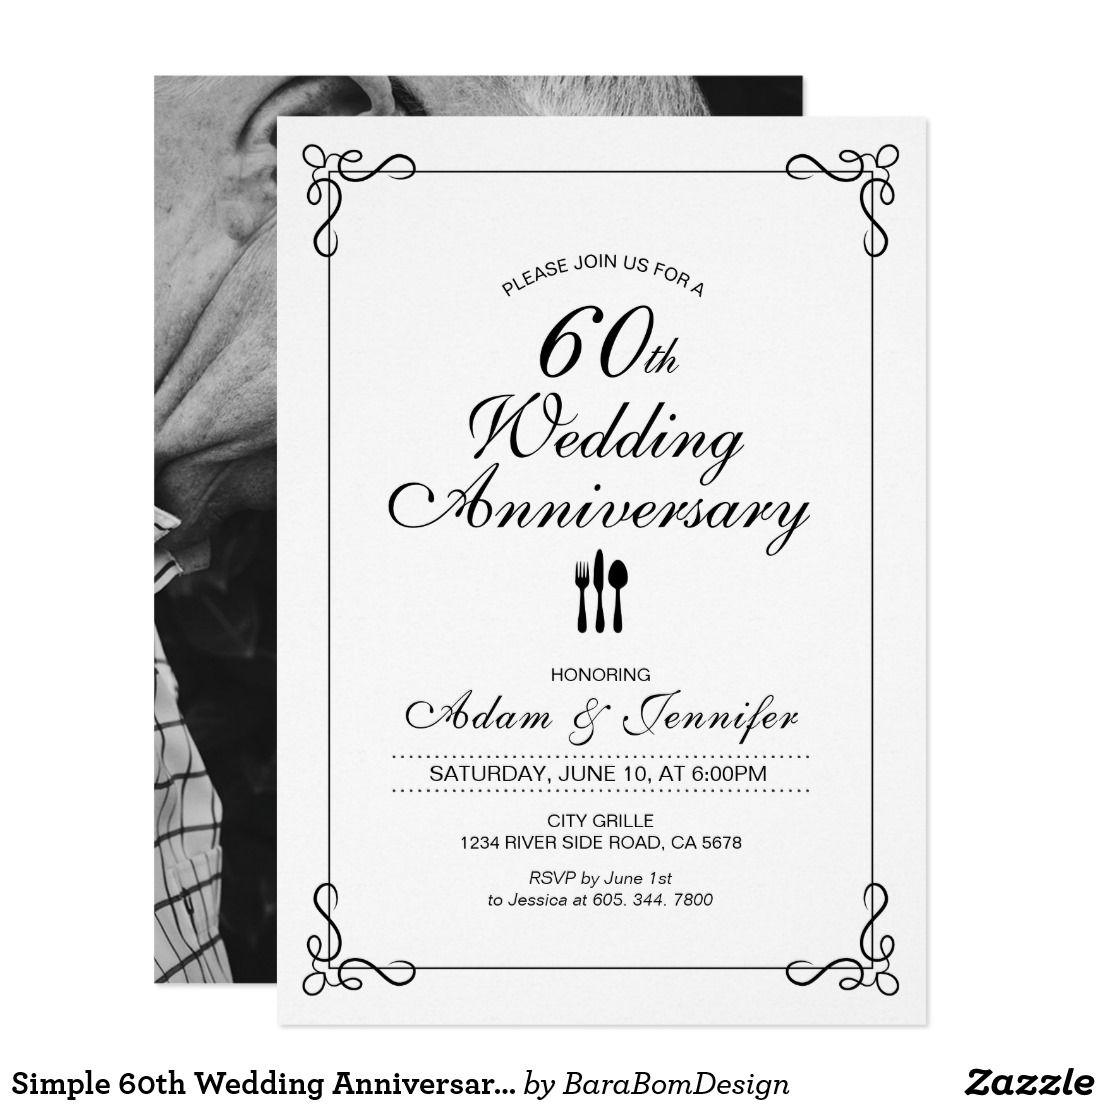 Simple 60th Wedding Anniversary Invitation Card | 60 wedding ...